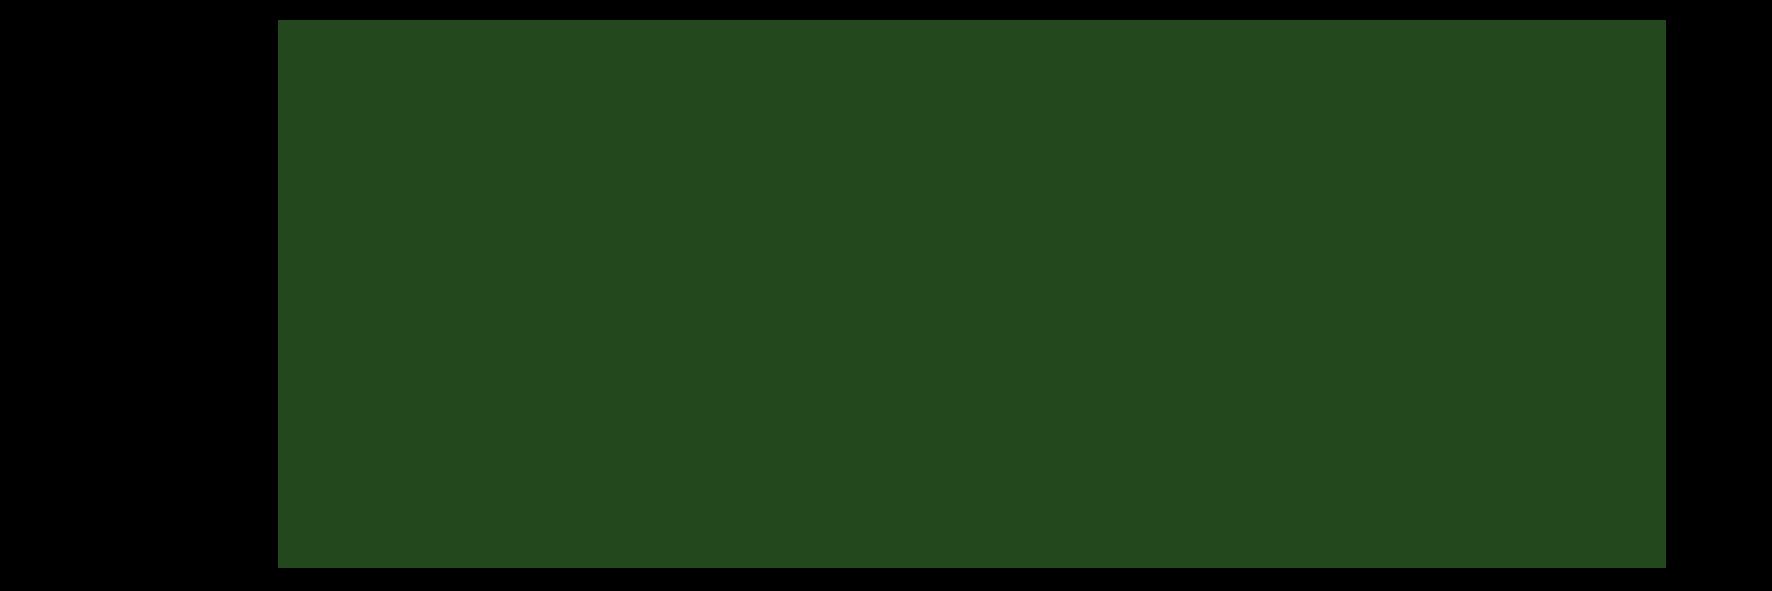 logo finiture green